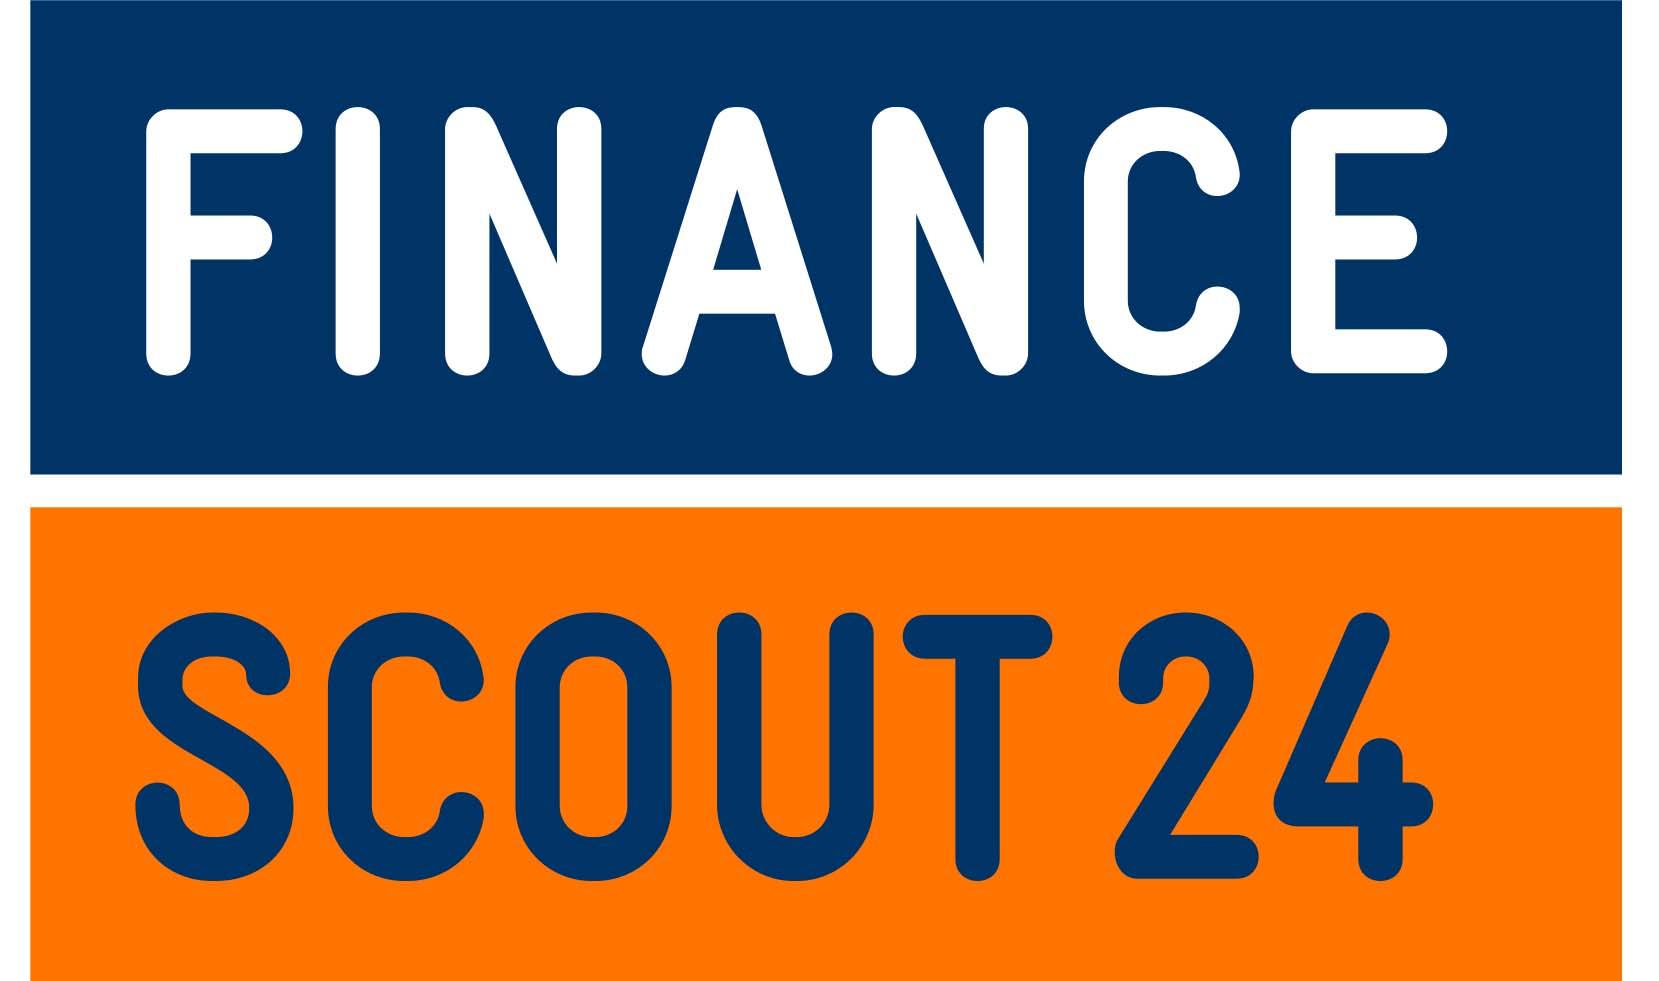 Finance Scout, Financ Scout24, FinanceScout24, FinanceScout 24, Hypothek, Immobilien, Krankenkasse, Versicherungen, Traum, Fantasie, Geldautomat, Bankomat, Bancomat, ATM, Crowdlending, Lend, Kredit Schweiz, Online-Kredit, Maximalzins, Zinsobergrenze, Fuchs, Bankgeheimnis, Kreditregister, Gold, Sparen, Leitzins, Geldschwemme, Foxcredit, Kleinkredit, Online Kredit, Onlinekredit, Finanzierung, Kredit, loan, Leasing, Zinssatz, Bank, Bankkonto, Bitcoin, Eurozone, Euro, Franken, Krypto, Dollar, Auto Kredit, Ferien Kredit, Wein Kredit, Immo Kredit, Raten Kredit, Medi Kredit, Privat Kredit, Klein Kredit, Sofort Kredit, Umschuldungskredit, Raten Kredit,bBudget, Reichtum, Milliarden, Pfandleihhaus, Festgeld, Bafin, Bankenaufsicht, Kreditwürdigkeit, Webtech Media, WebTech, Website Design, Website Flaterate, webtech2web, Girokonto, WestLotto, Euromillions, Deutsche Lotterie, Lotto, Jackpot, CrediMaxx, Budget Check, BudgetCheck, Budget Credit Check, Ava, Ava trade, avatrade, trading, Hotfox, CapTrader,